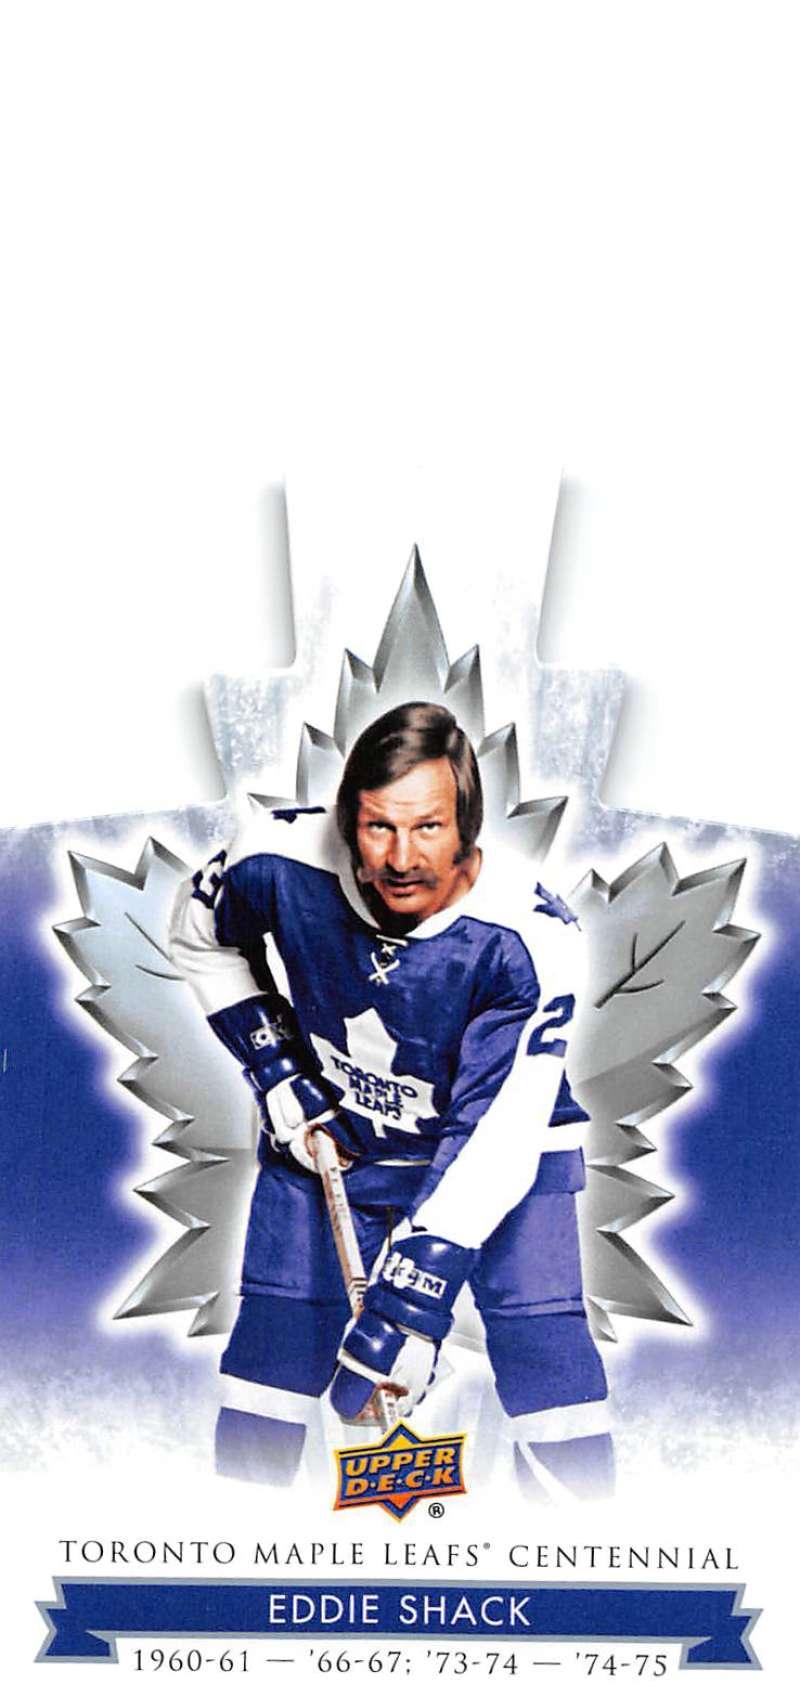 2017-18 Upper Deck Toronto Maple Leafs Centennial Blue Die Cuts